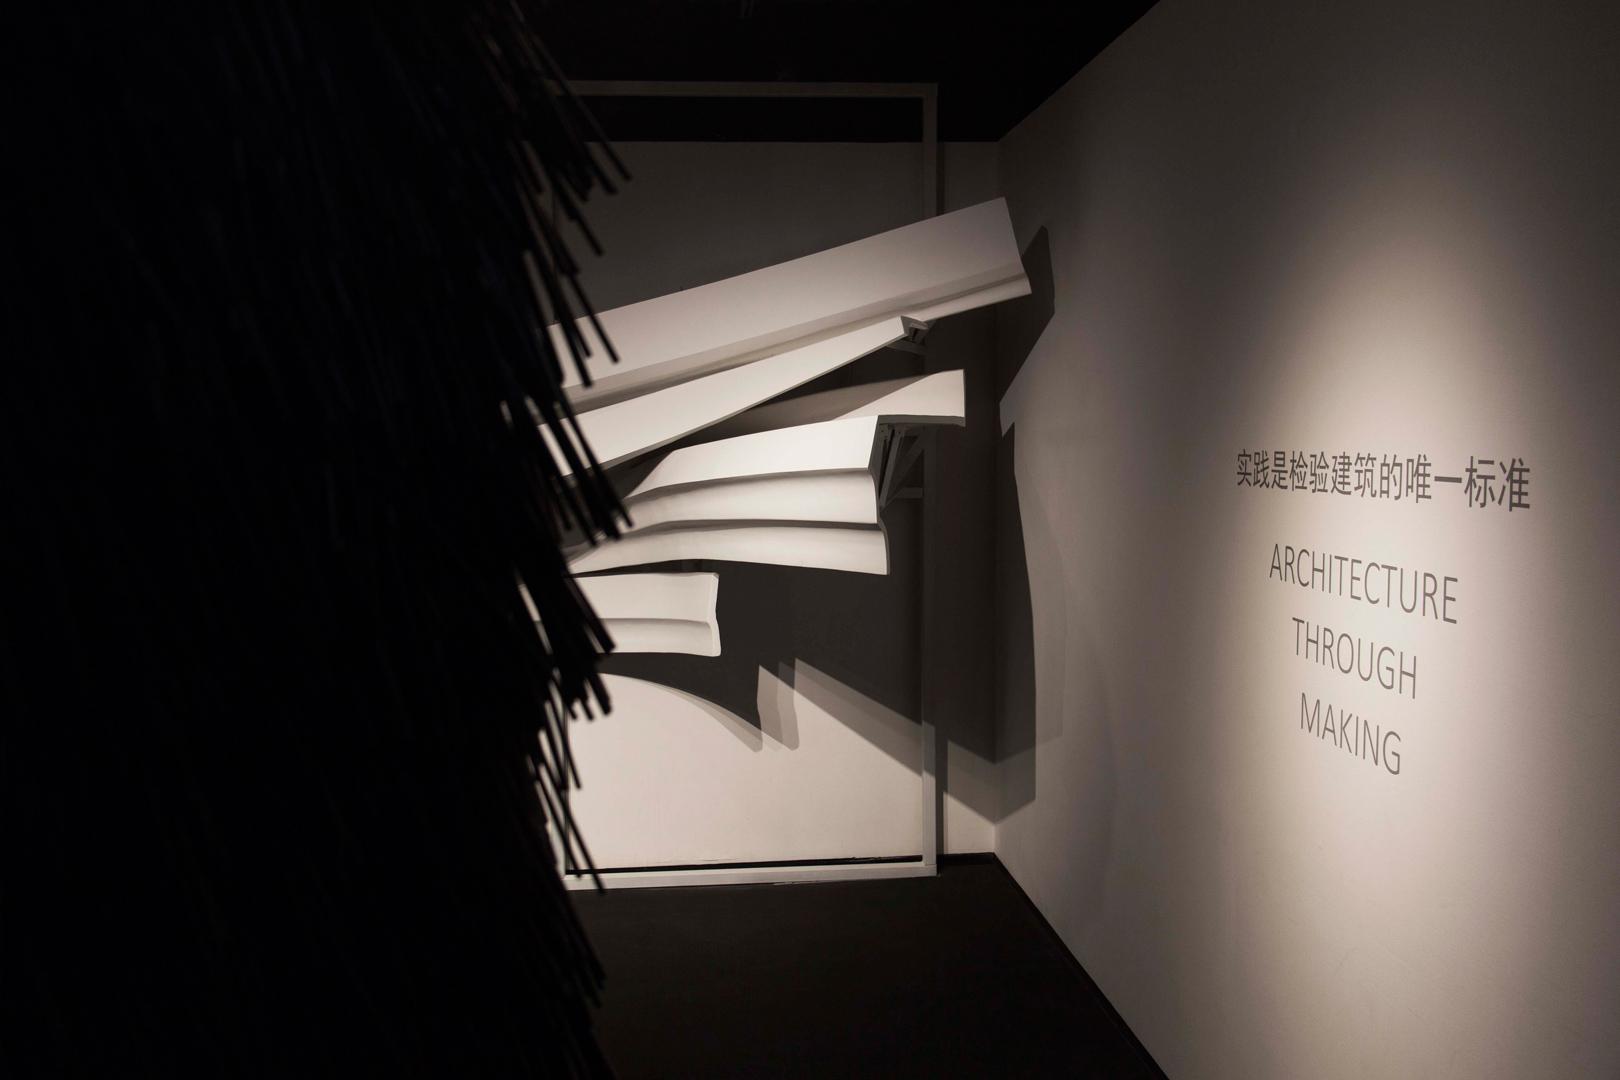 waa workshop architecture through making 未觉建筑实践是建议建筑的唯一标准